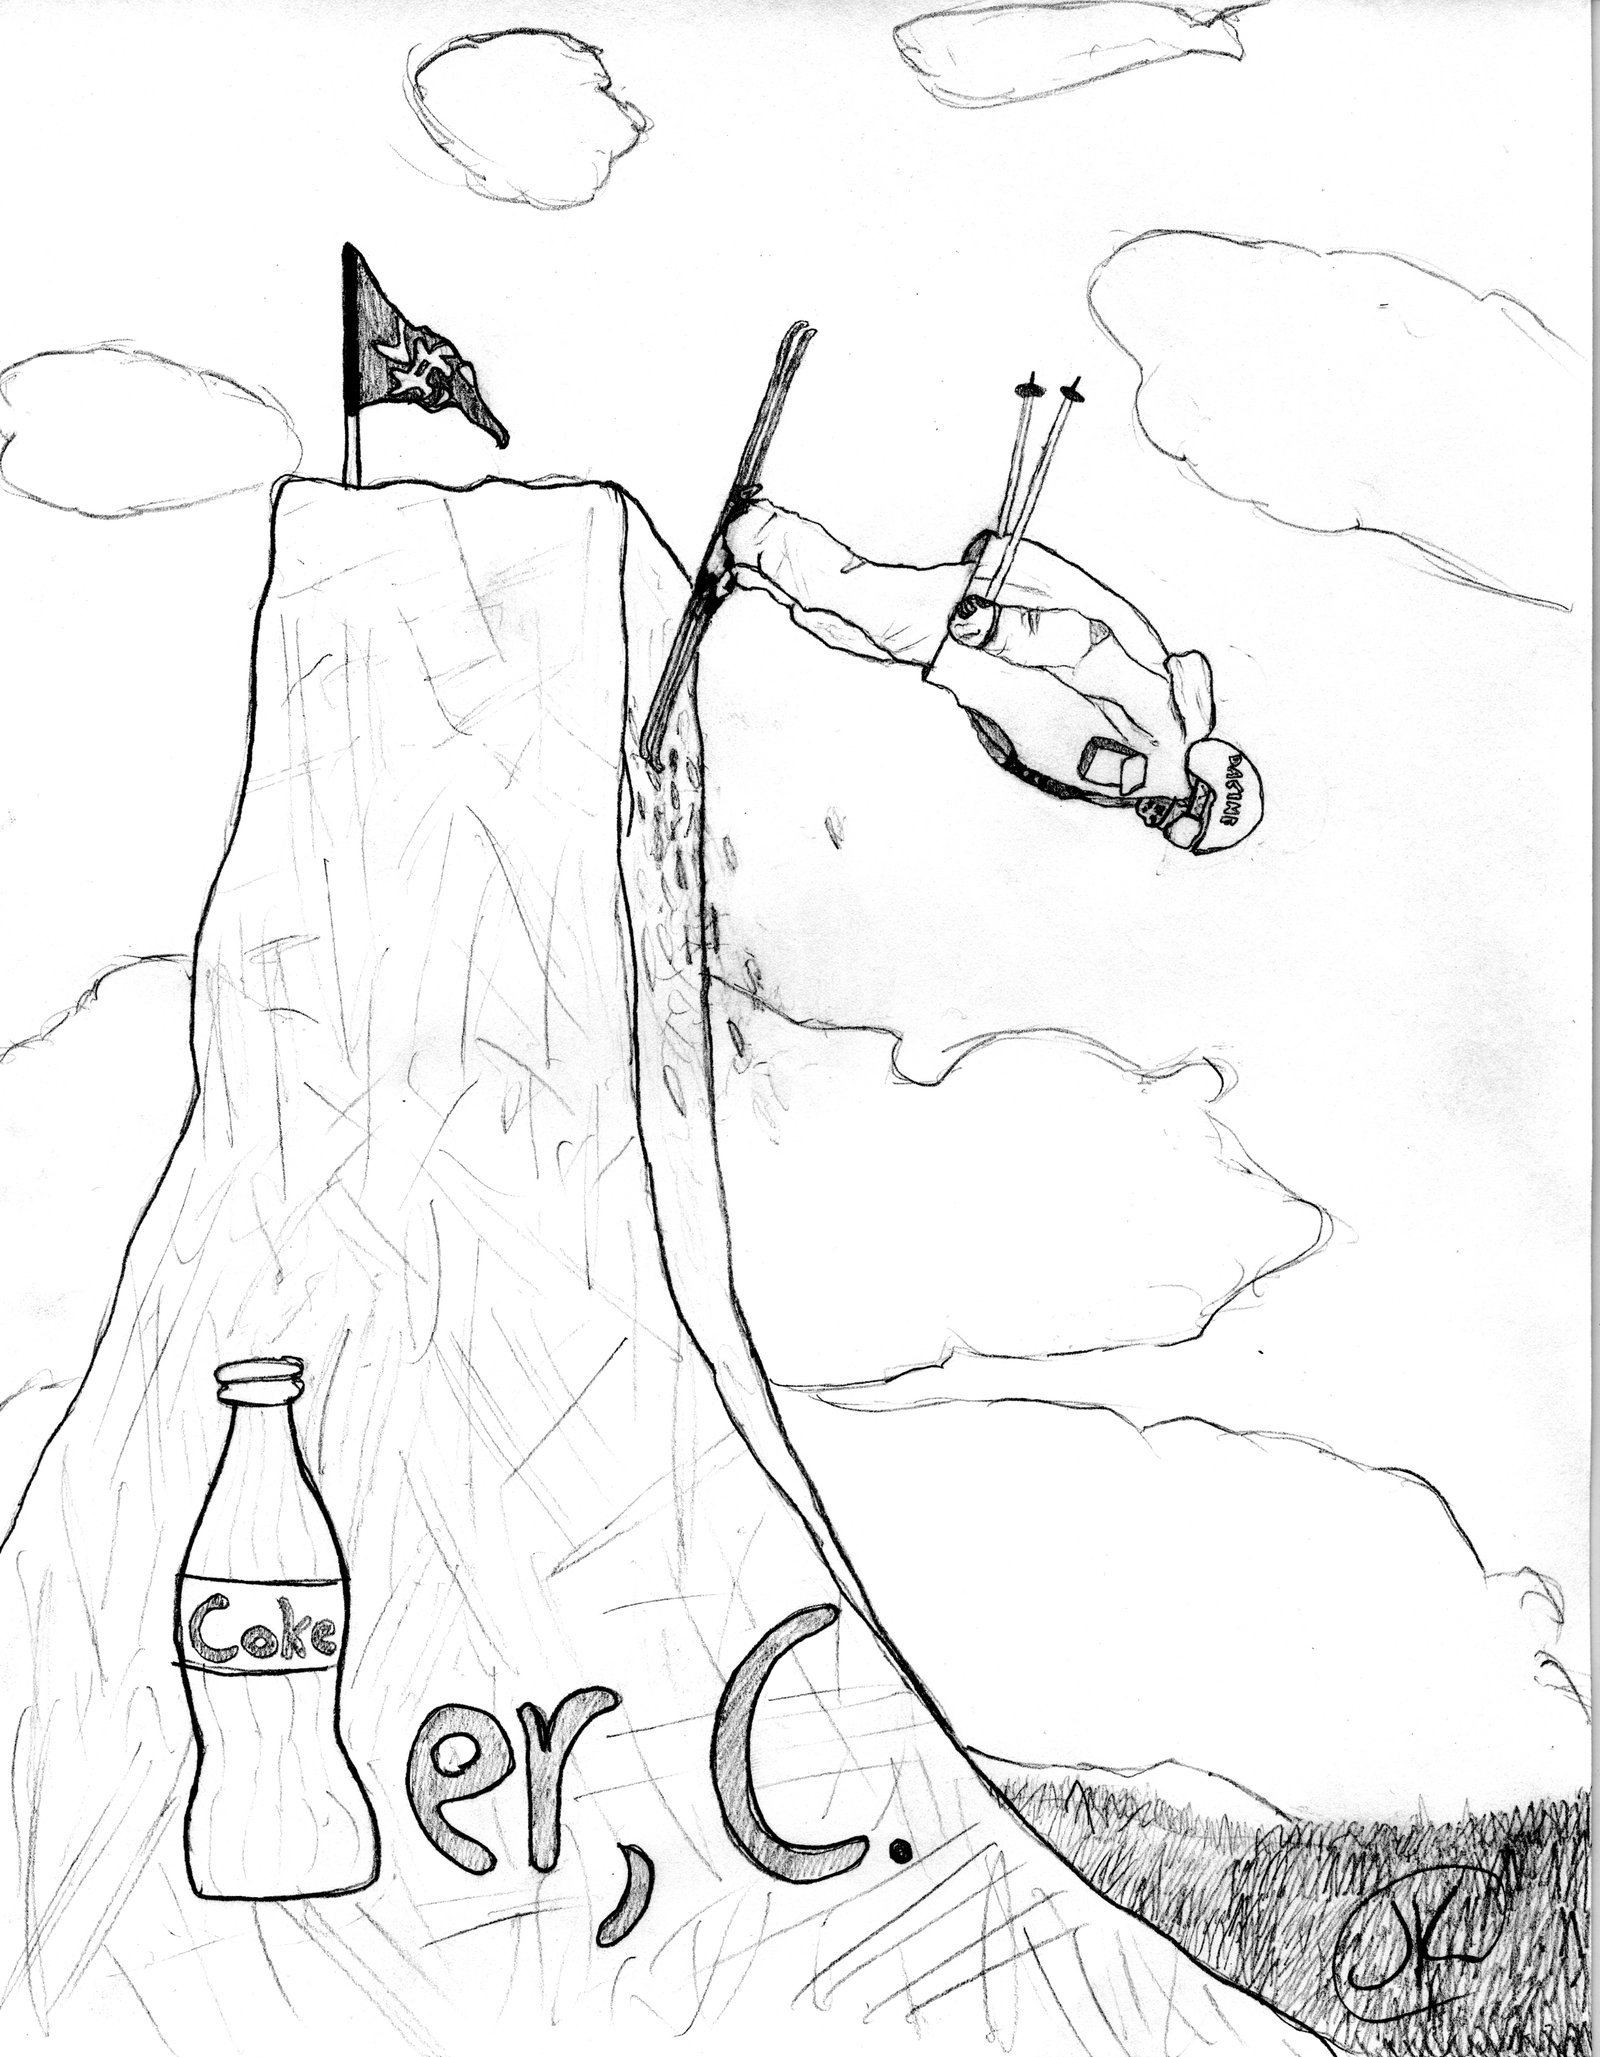 Coker drawing